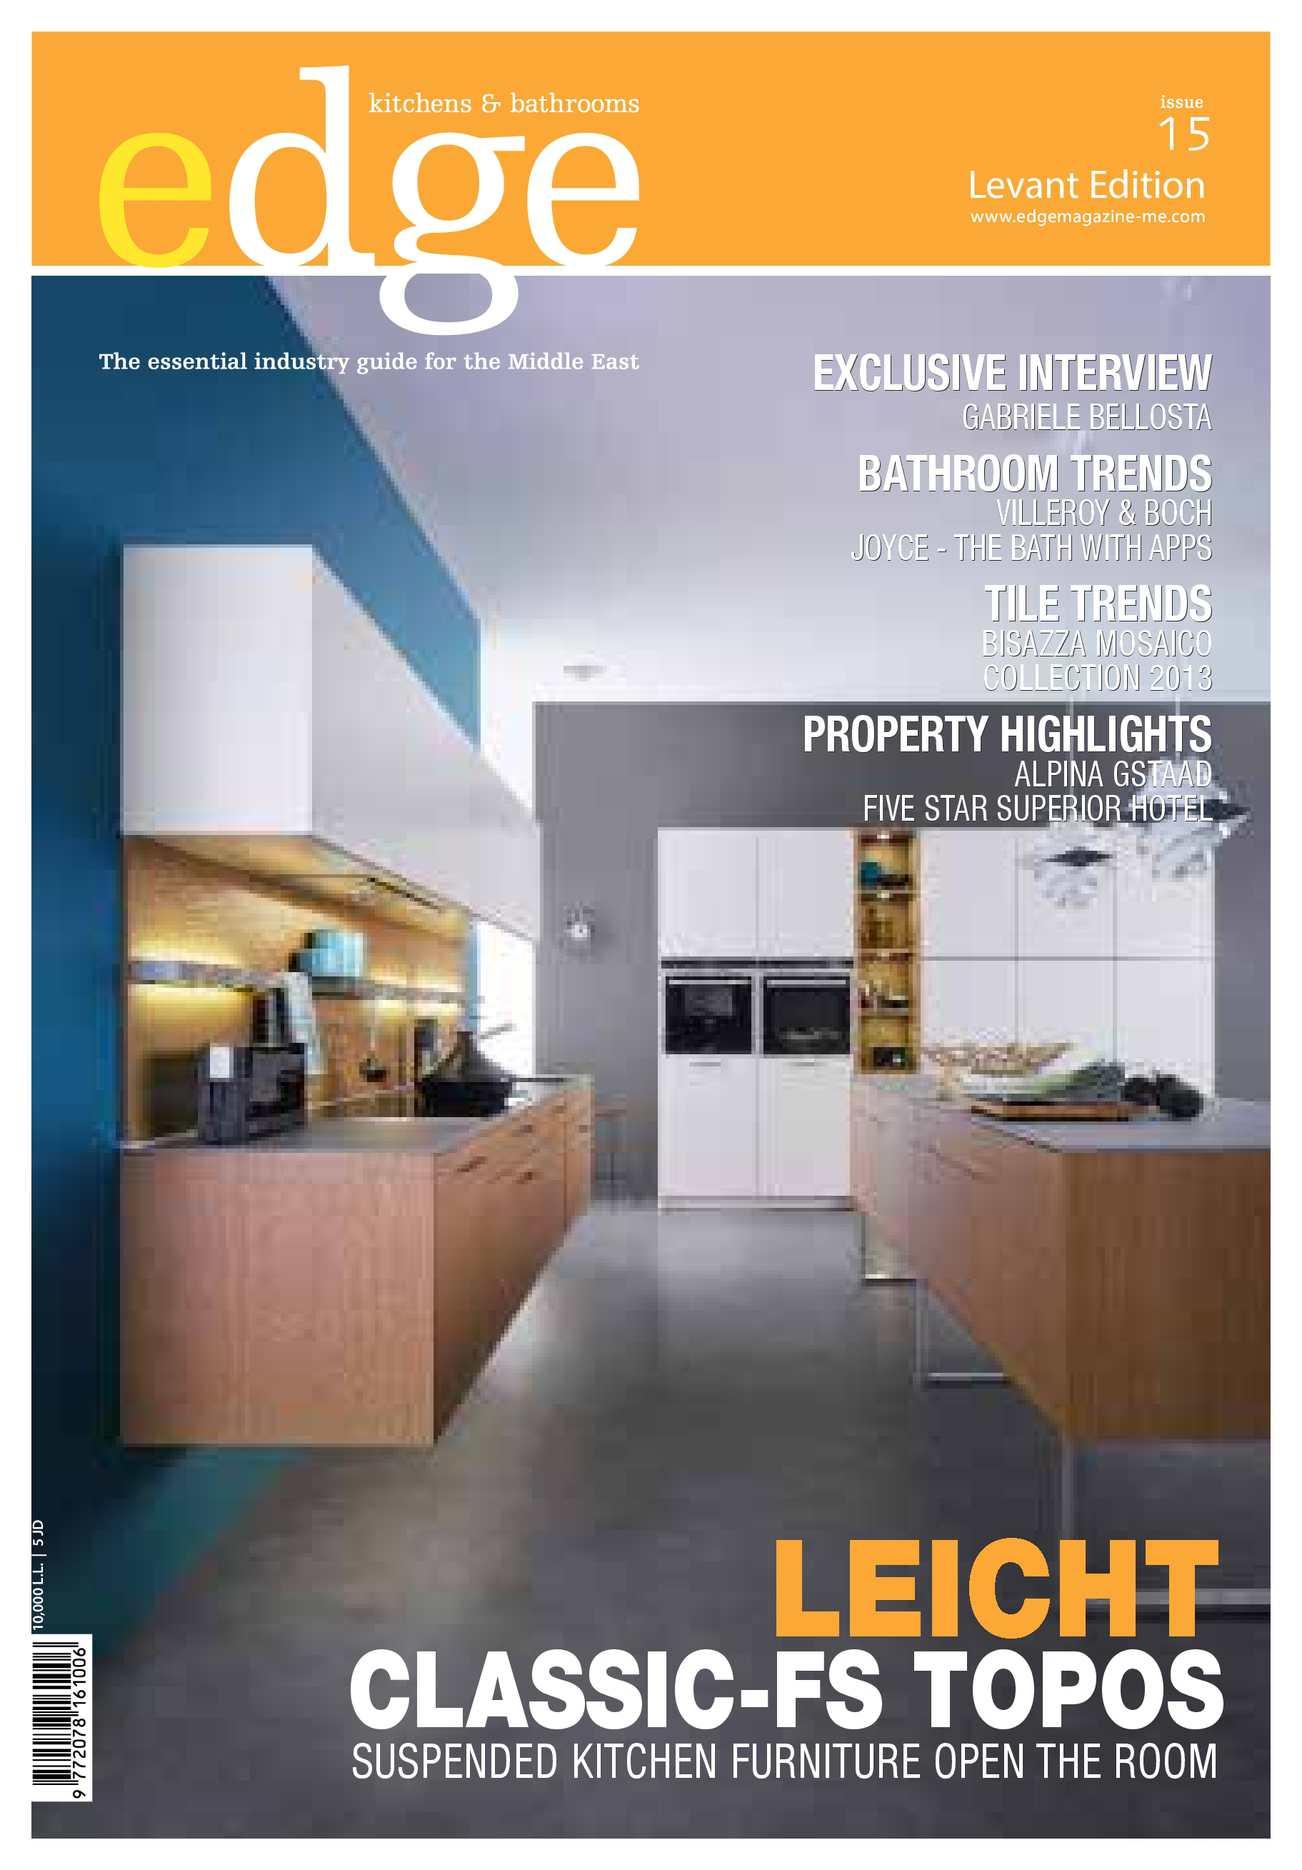 Calaméo - EDGE Kitchens & Bathrooms Magazine Levant issue 15